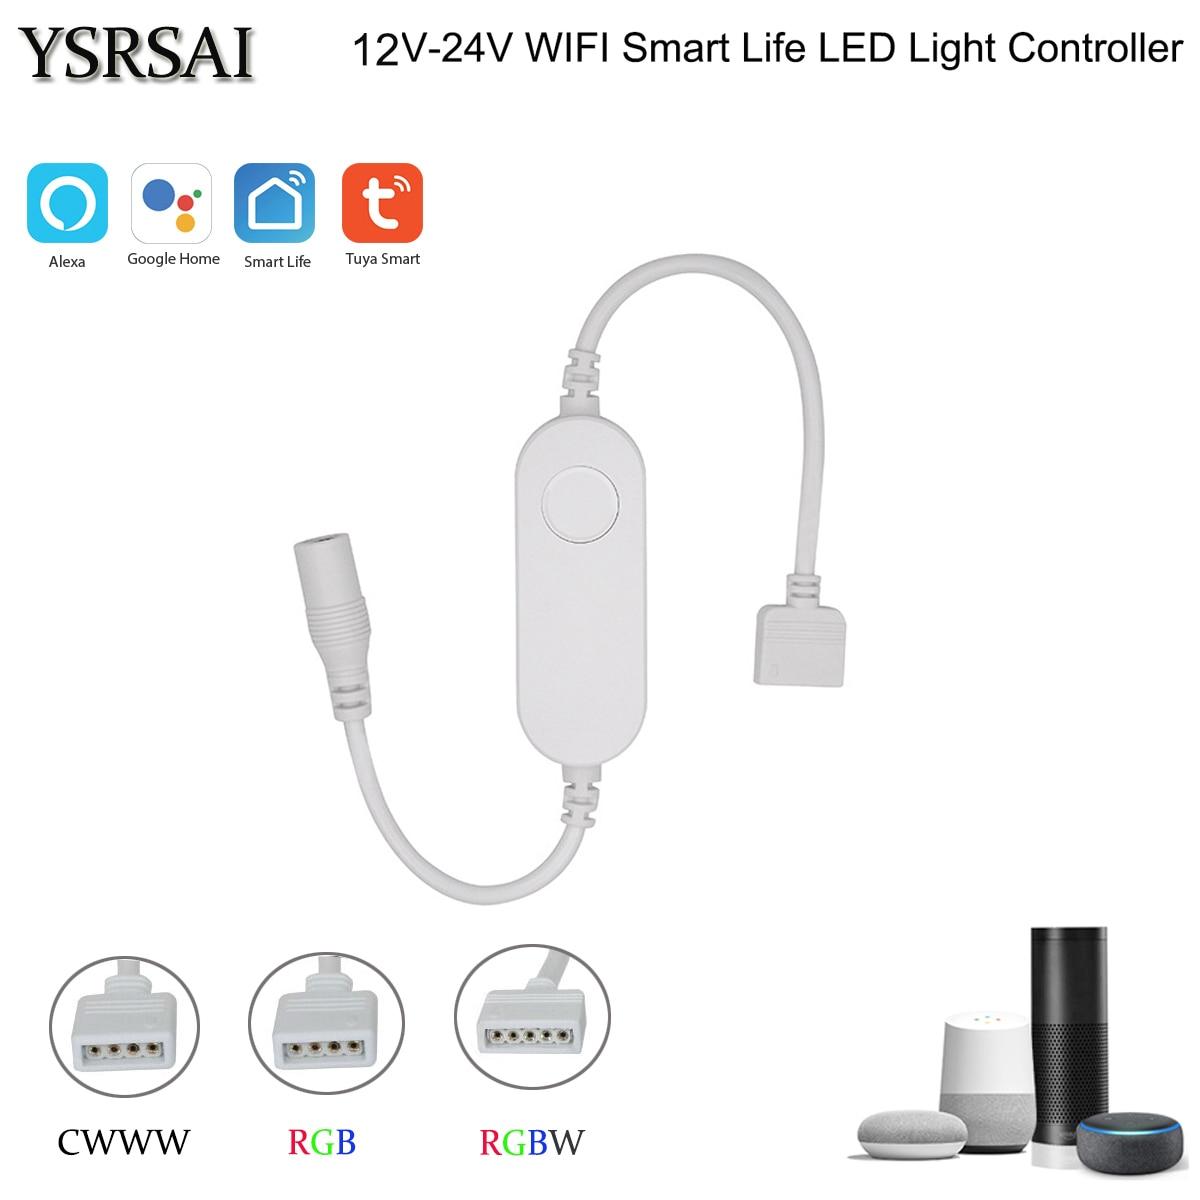 Tuya Smart Life APP 12v-24V Wifi CCT/RGB/RGBWW led Light Strip Wireless Remote Controller Smart Home work with Alexa Google Home(China)